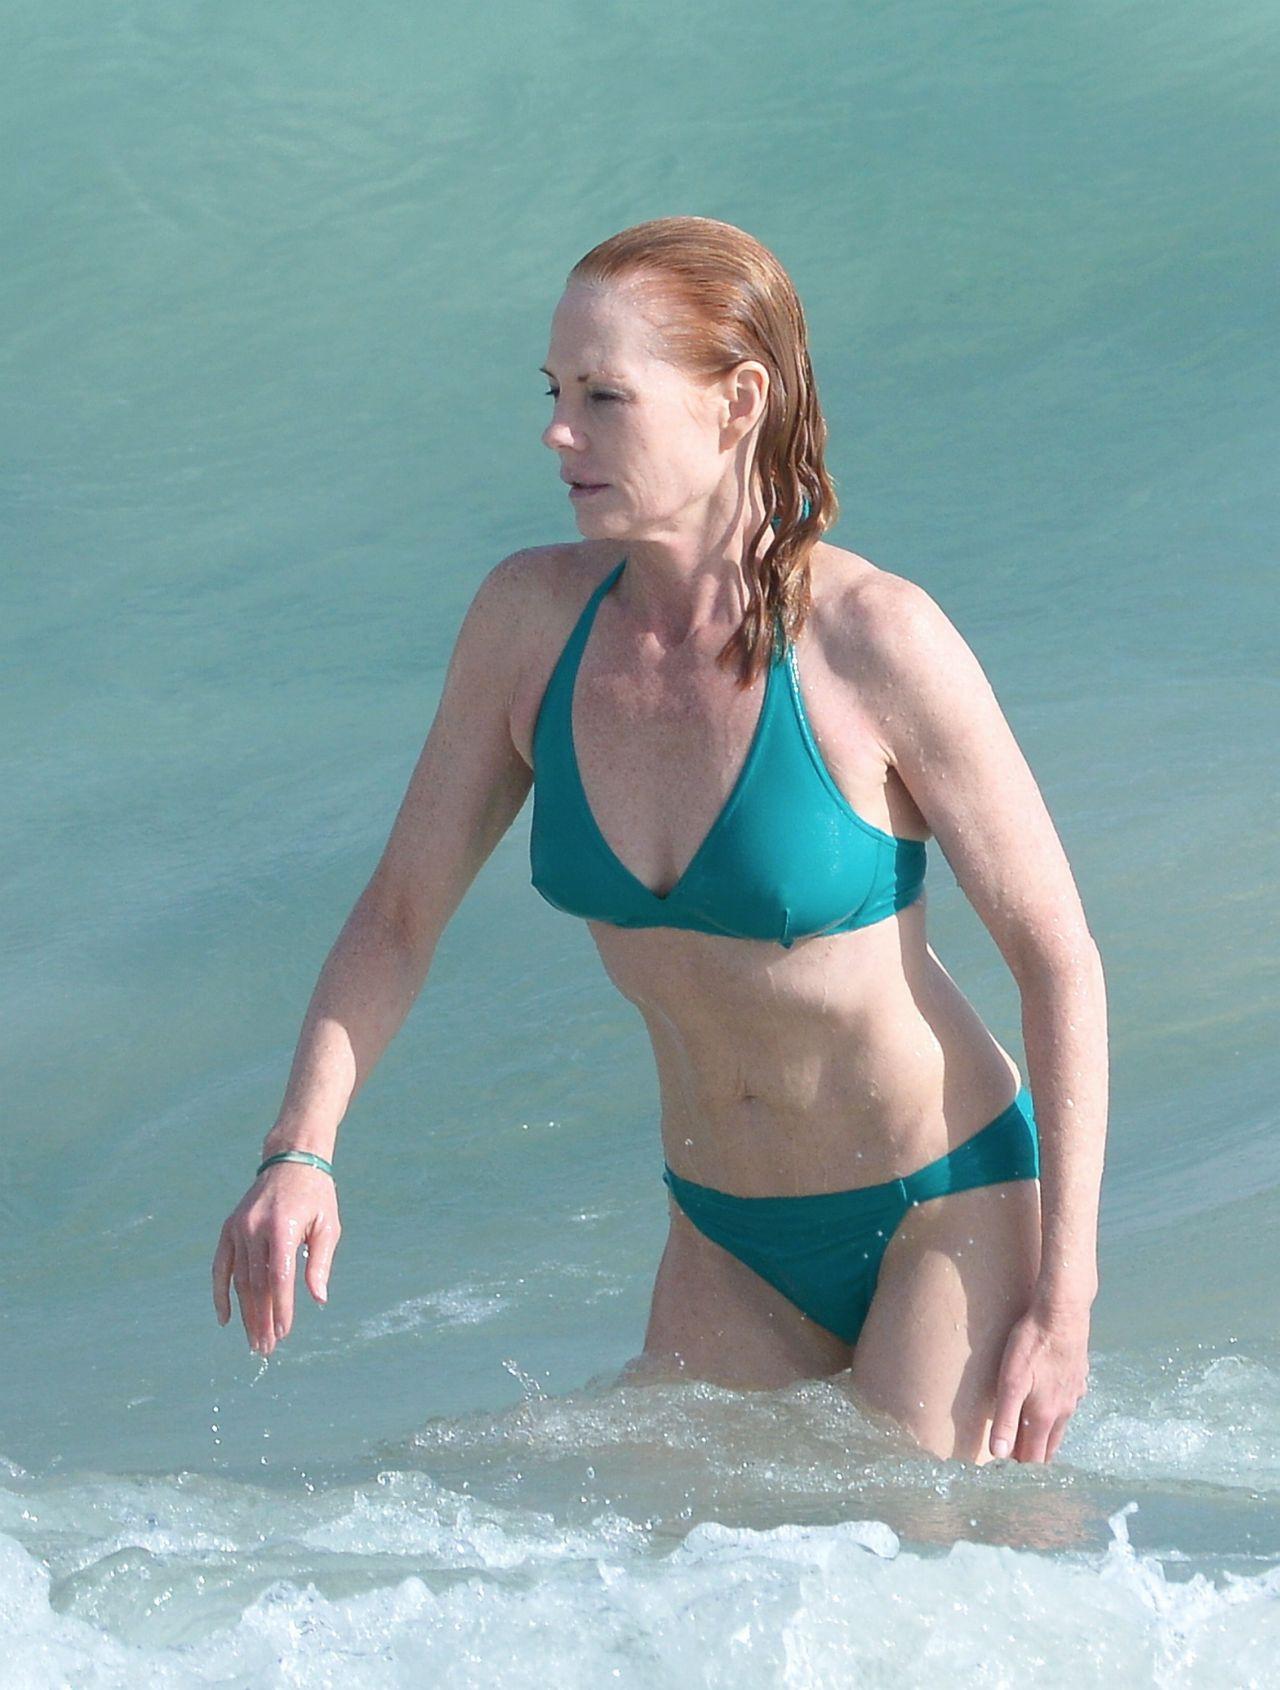 Marg Helgenberger Bikini Candids - St Barts, December 2013